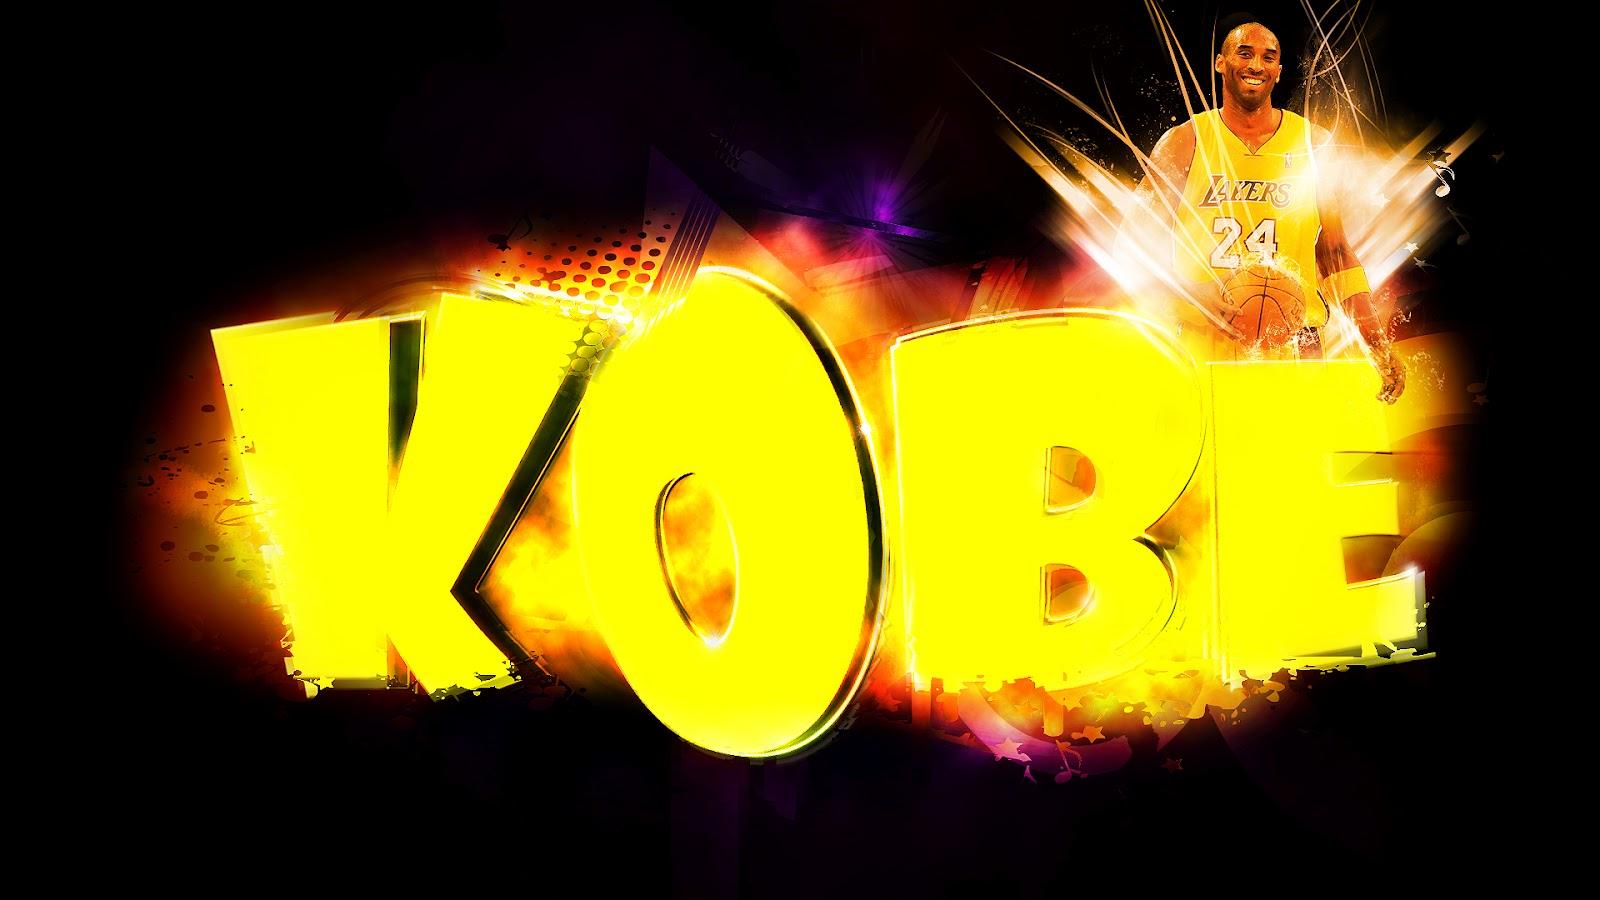 http://2.bp.blogspot.com/-ATH7wTmIvVg/T79WNqyHpMI/AAAAAAAABL4/ArT4oh6P8A4/s1600/Kobe_Bryant_wallpaper_24_by_AminKazama.jpg